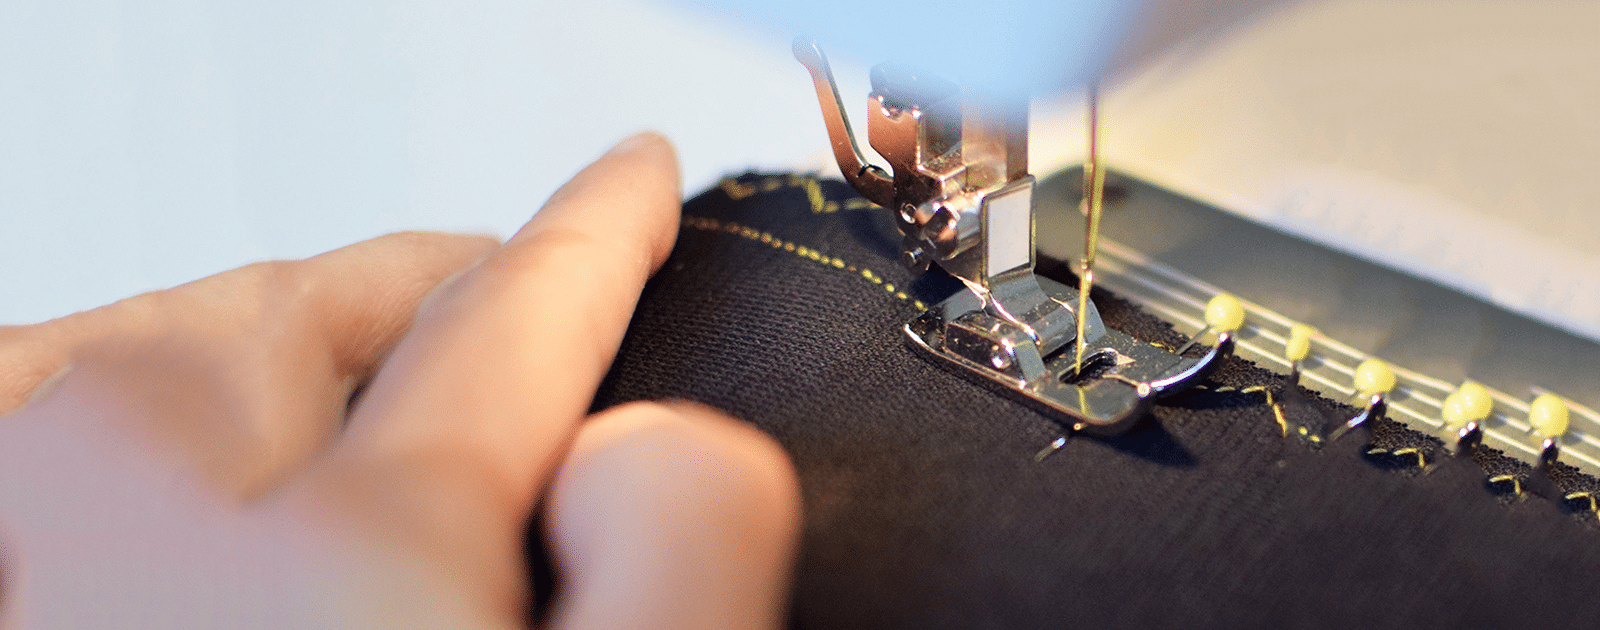 Fabrique ton tablier en lin